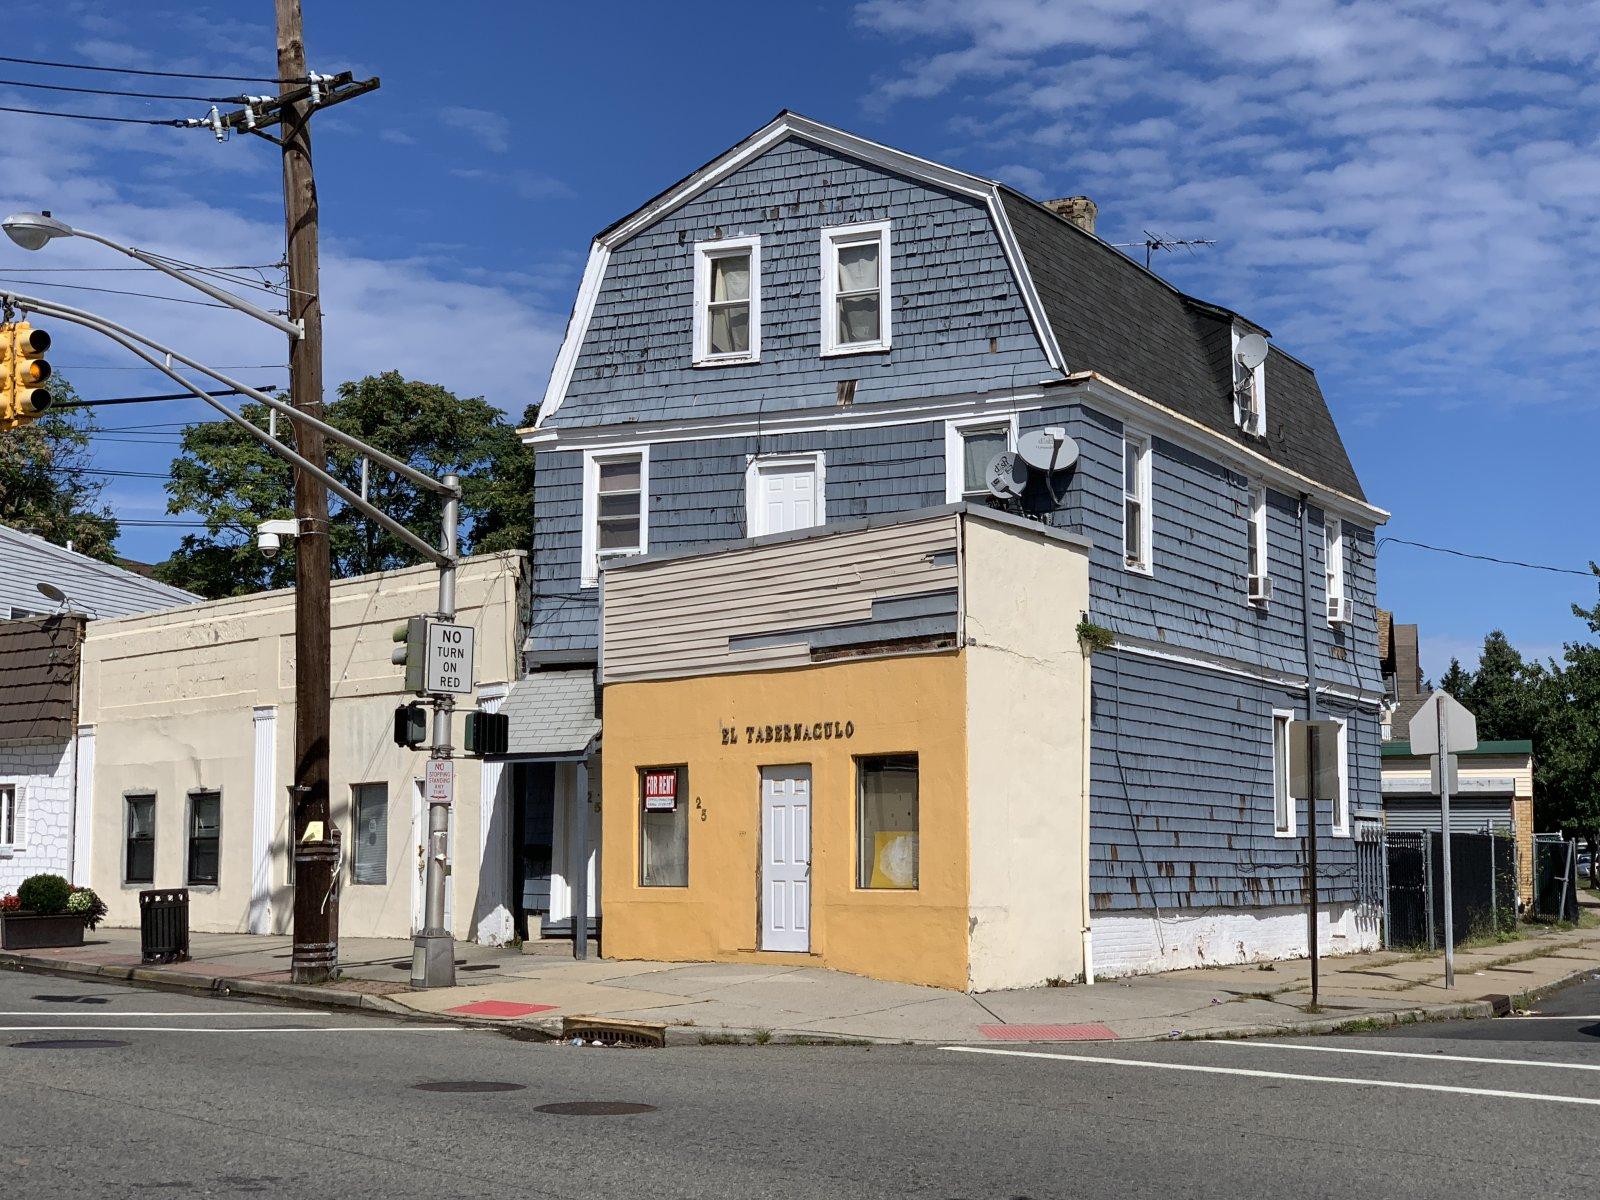 Selling My House Fast in Newark, NJ